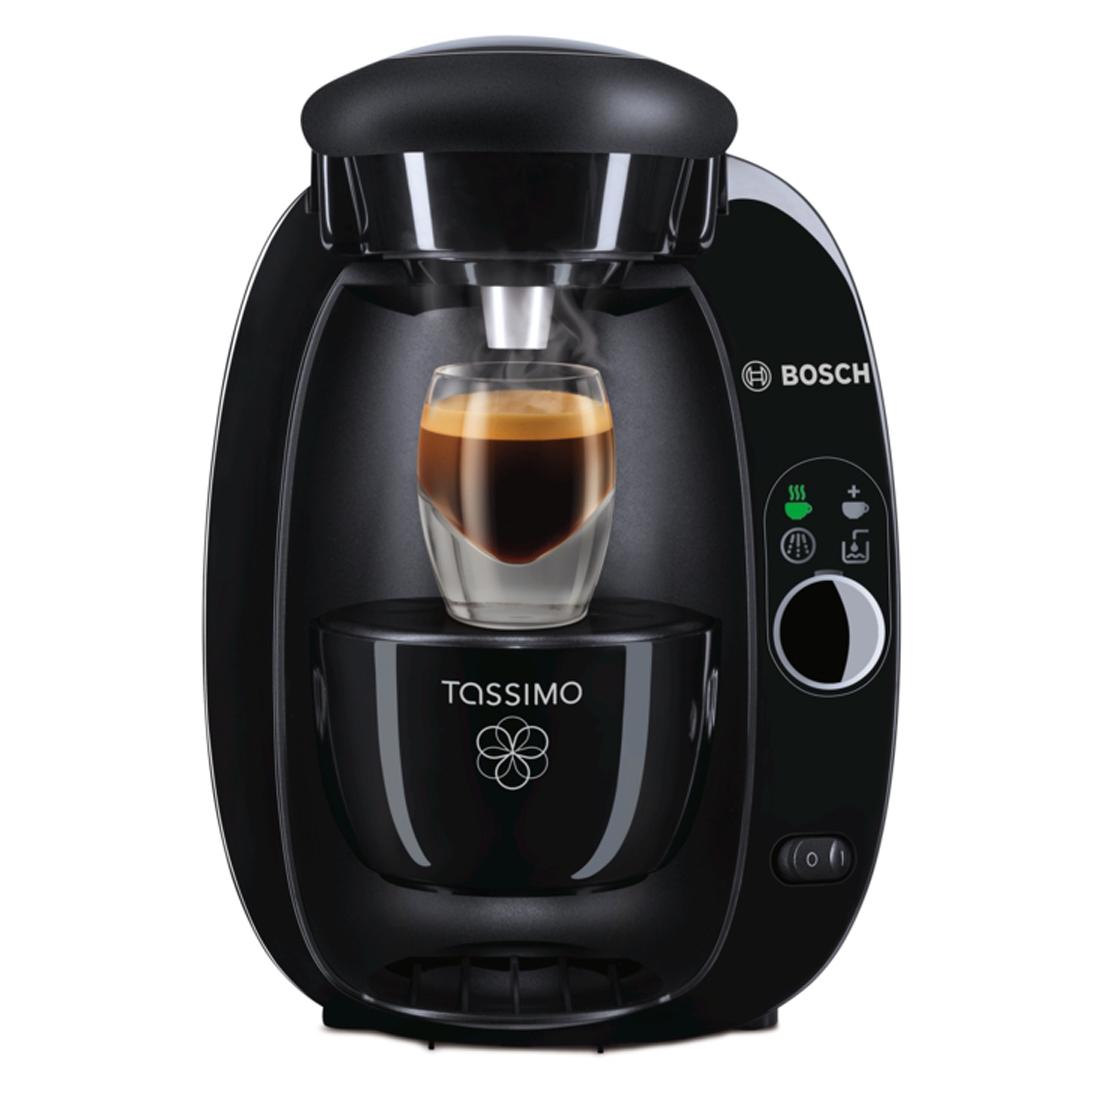 bosch tassimo amia tas2002gb espresso coffee machine hot. Black Bedroom Furniture Sets. Home Design Ideas